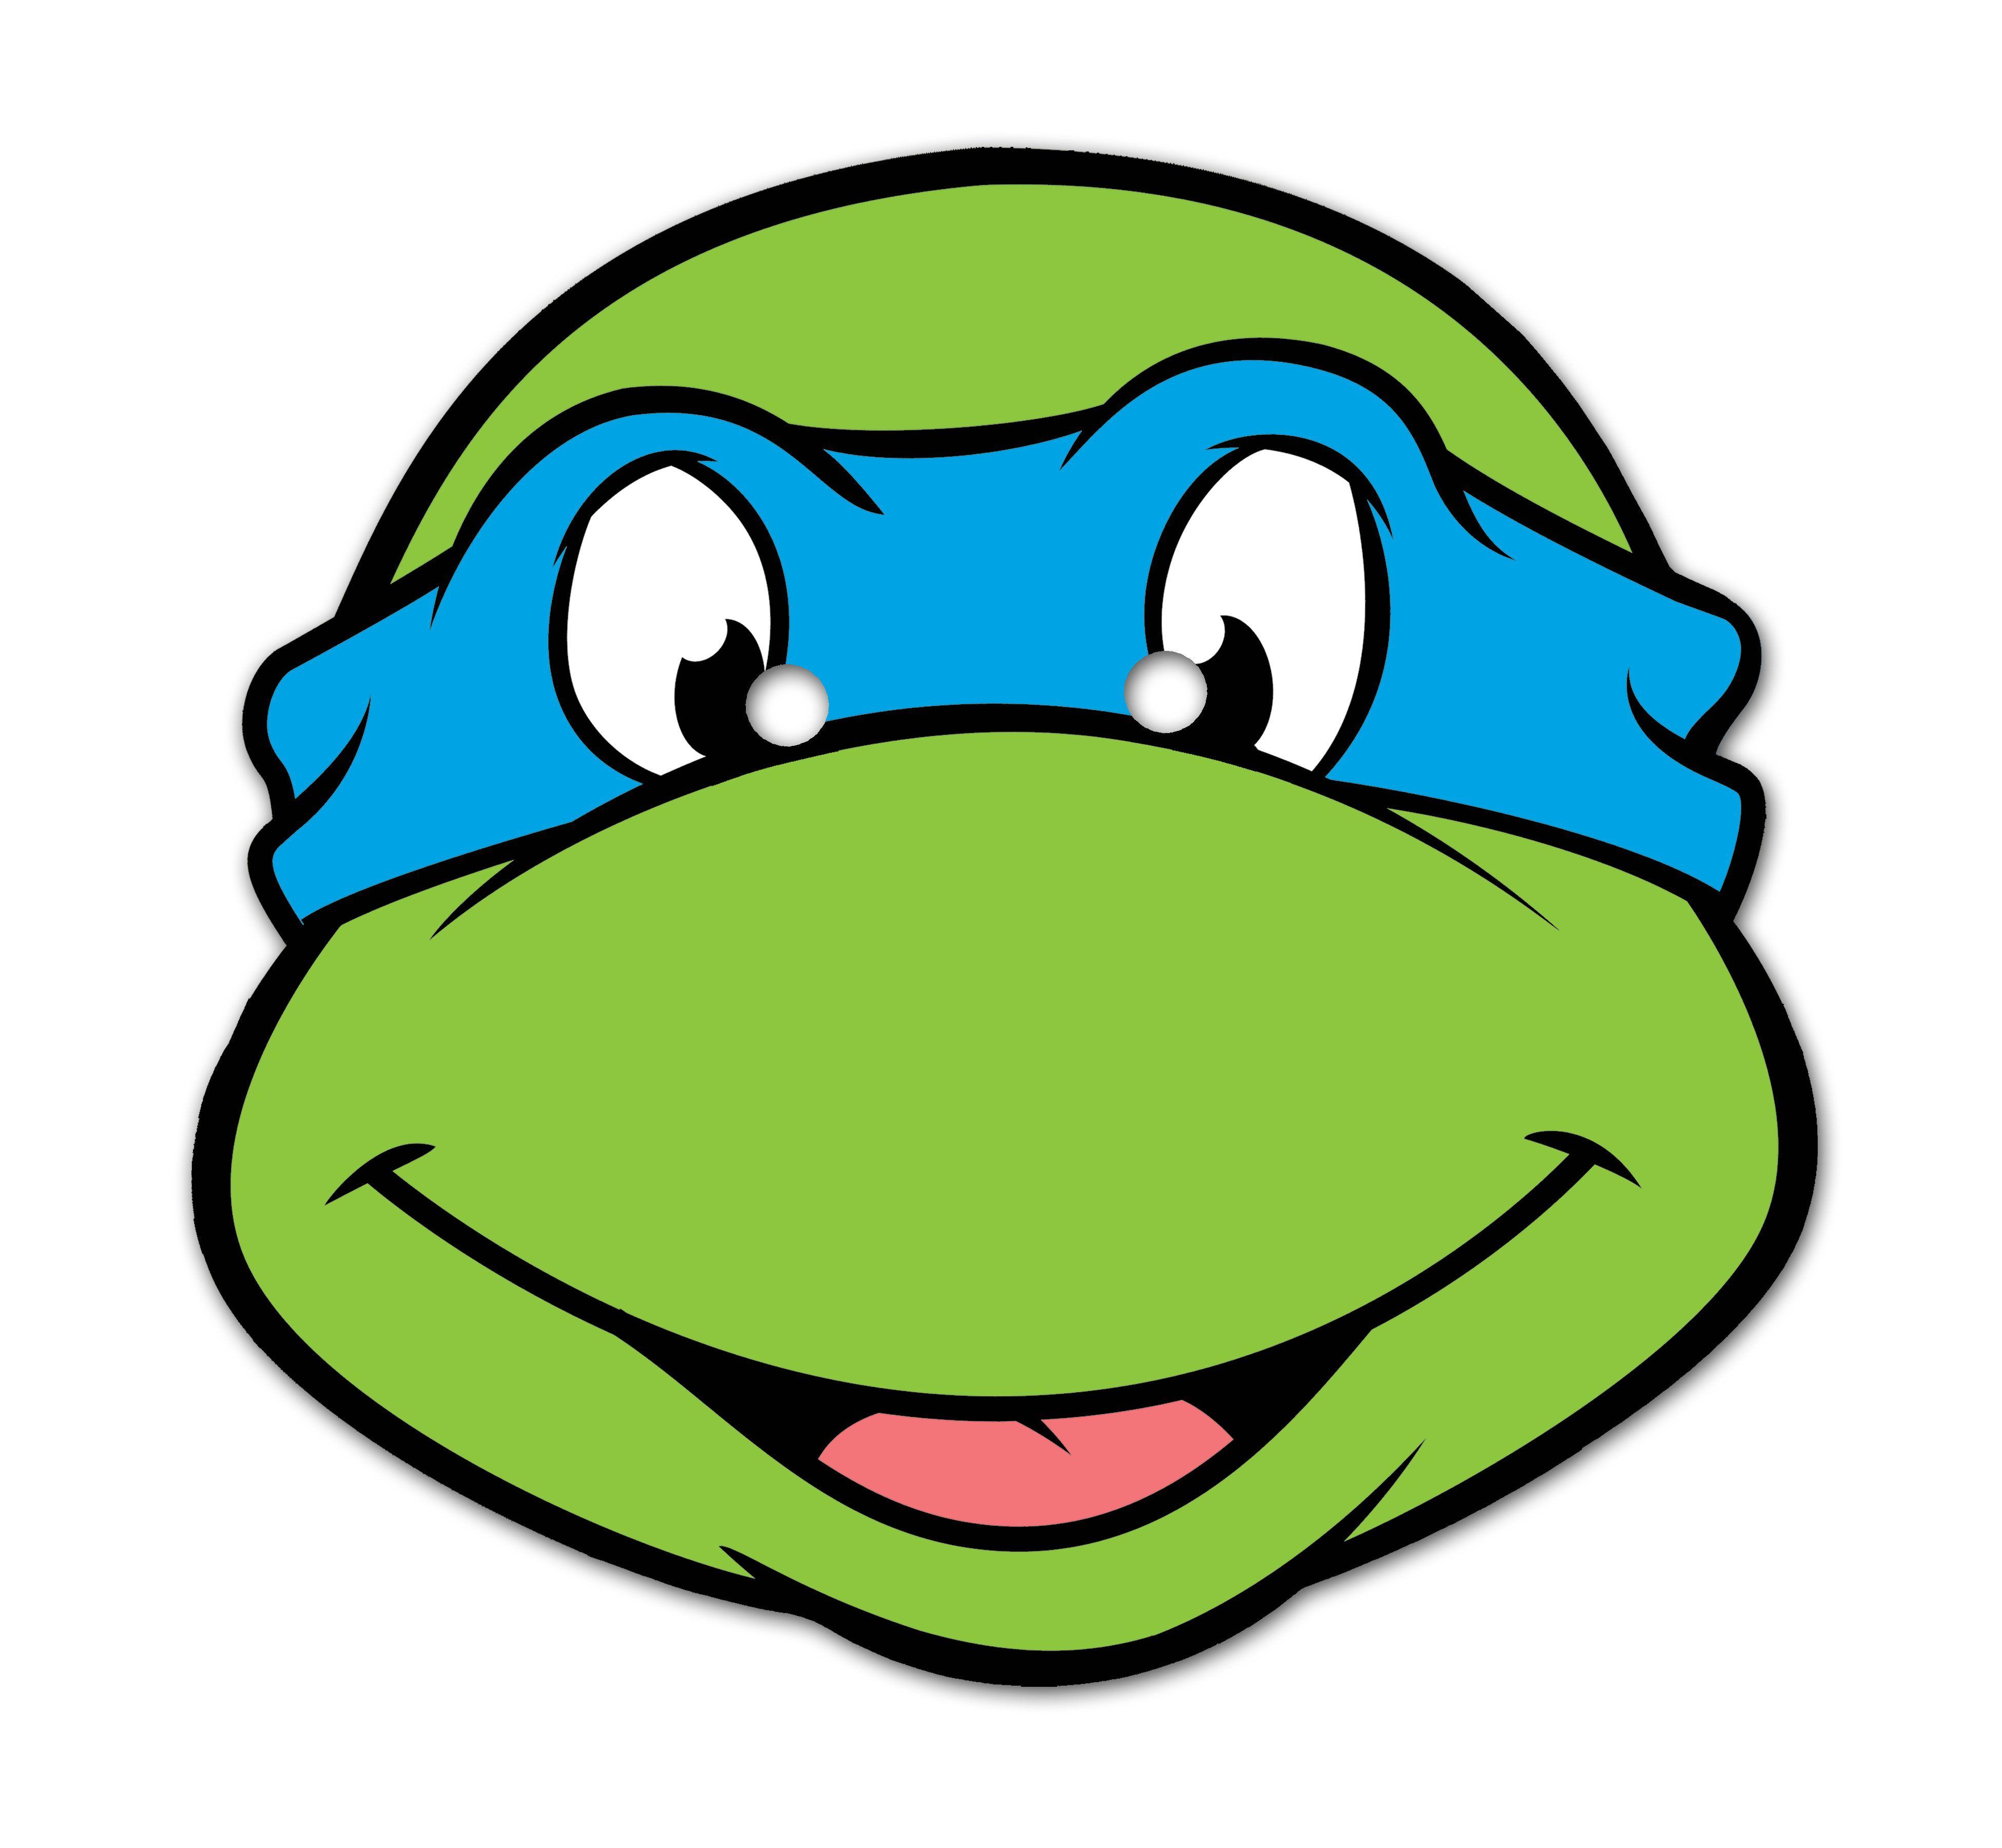 michelangelo ninja turtle face leonardo face ninja turtle rh pinterest com ninja turtle clipart free ninja turtles clipart